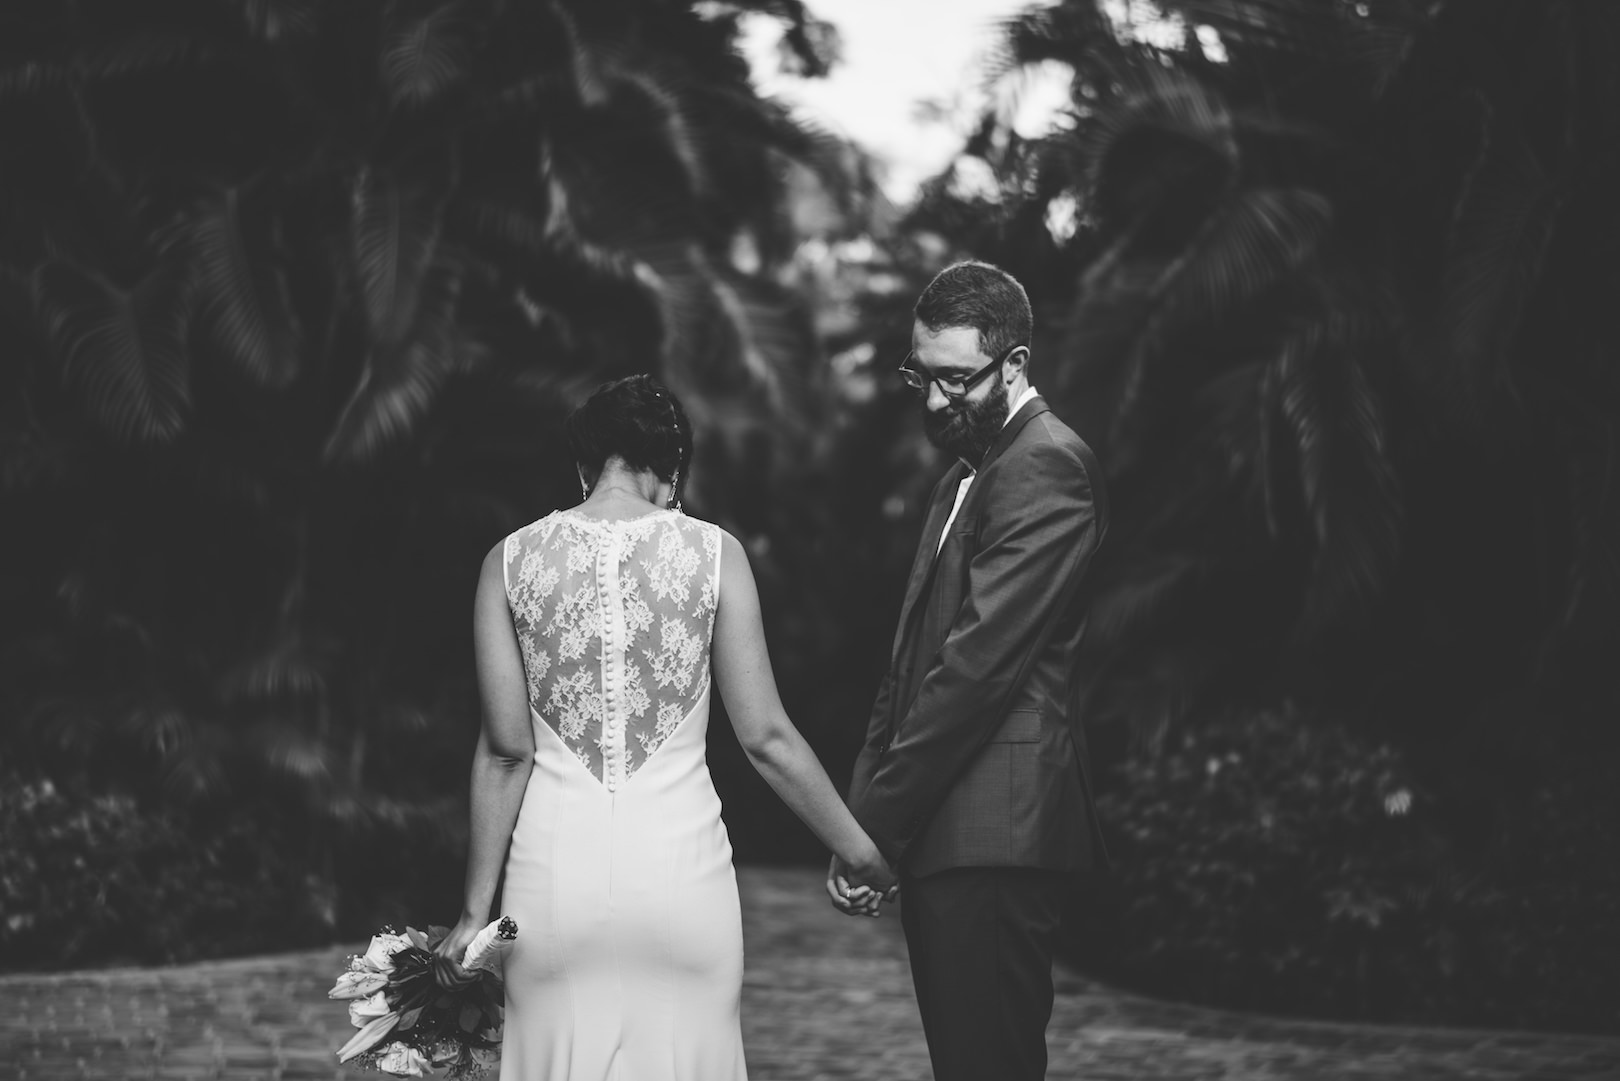 Nathan & Felicia - Wedding Day - © Dallas Kolotylo Photography - 291